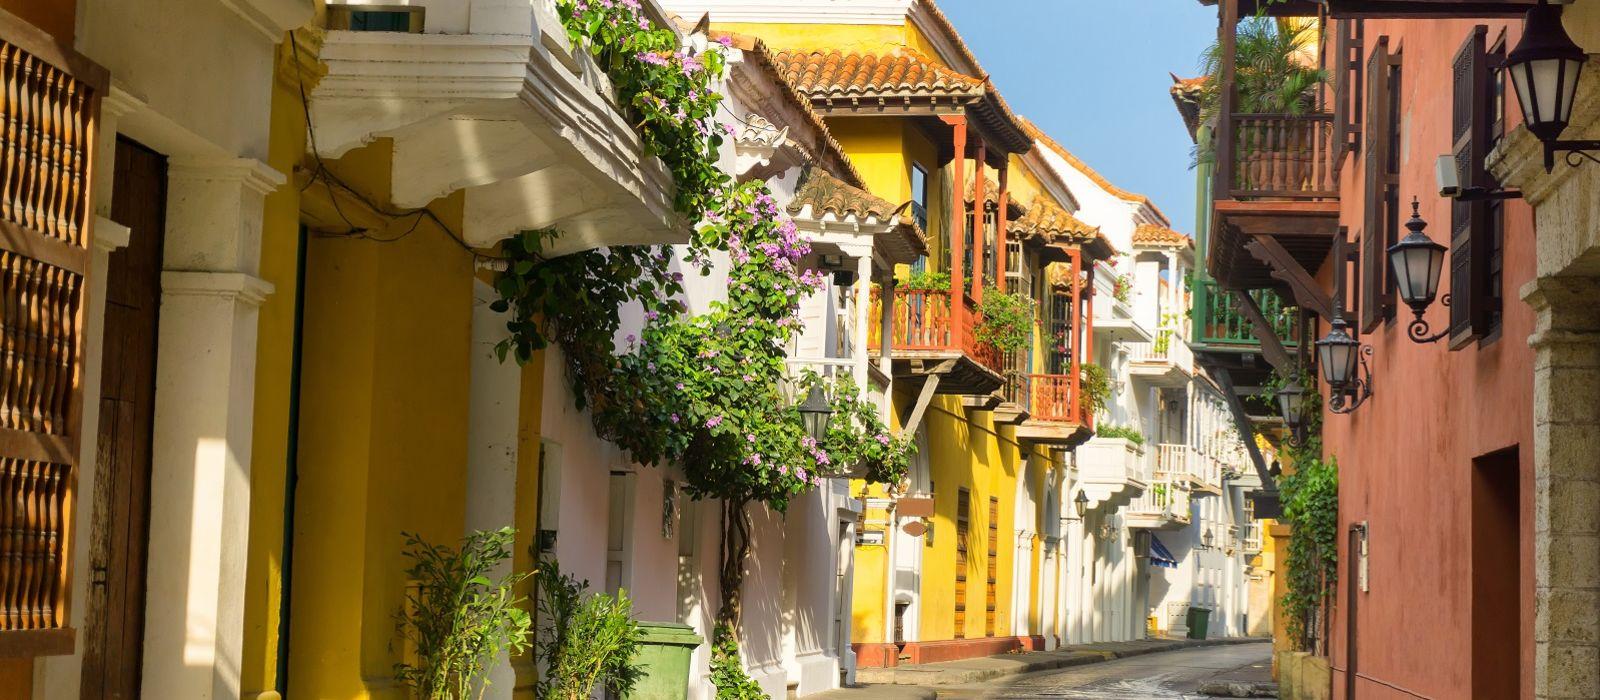 Kulturelles Ecuador und bezauberndes Kolumbien Urlaub 3